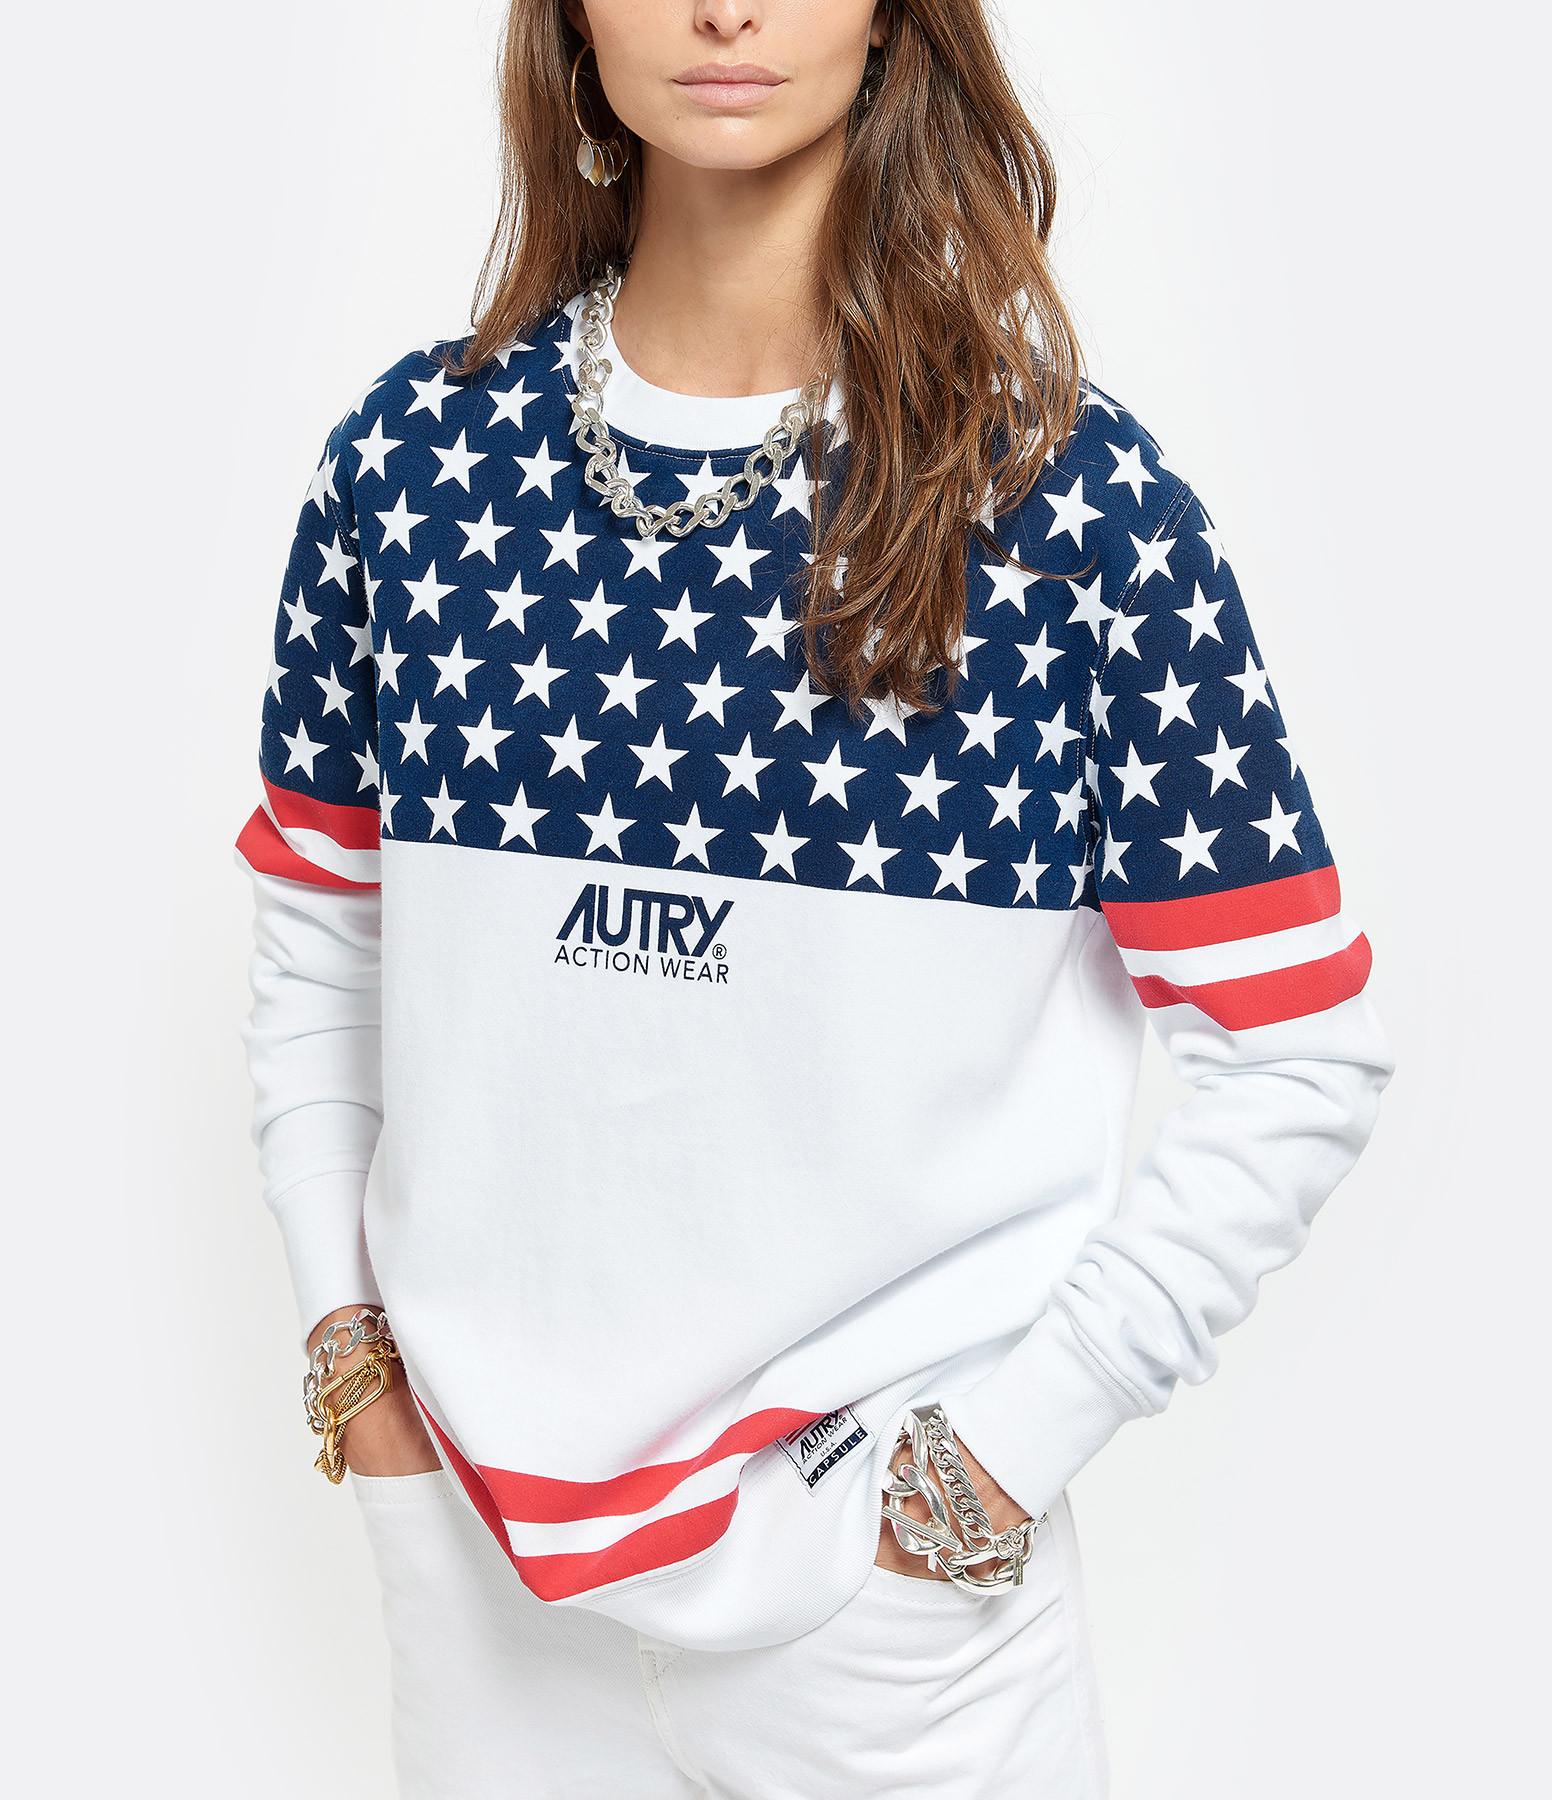 AUTRY - Sweatshirt Star USA Coton Blanc, Capsule